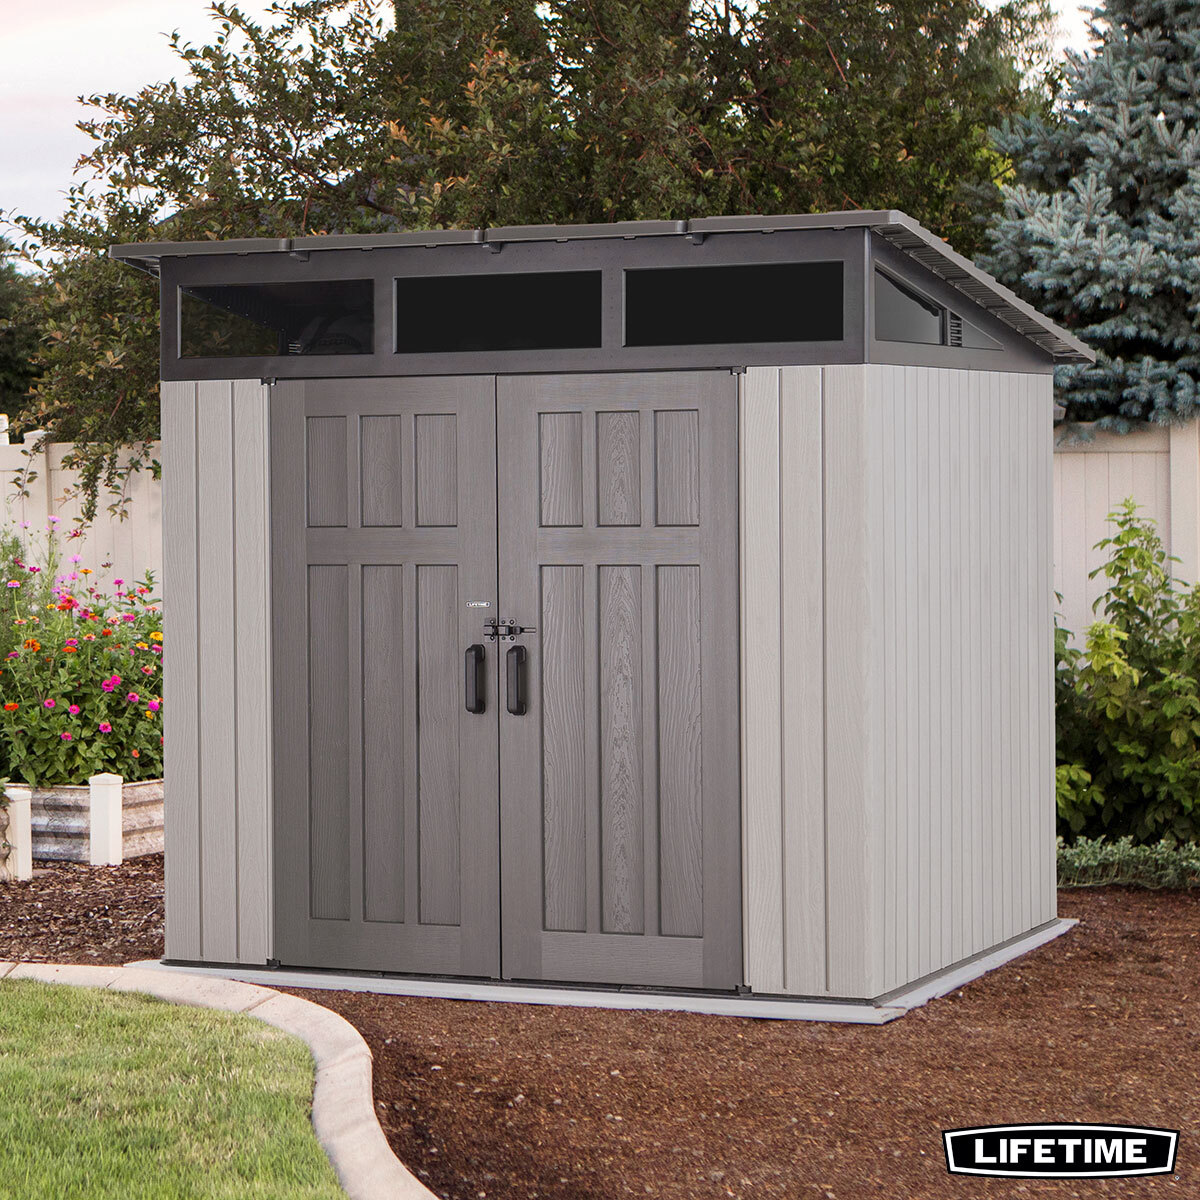 Lifetime 7ft 6 X 7ft 6 2 32 X 2 32m Studio Storage Shed Costco Uk